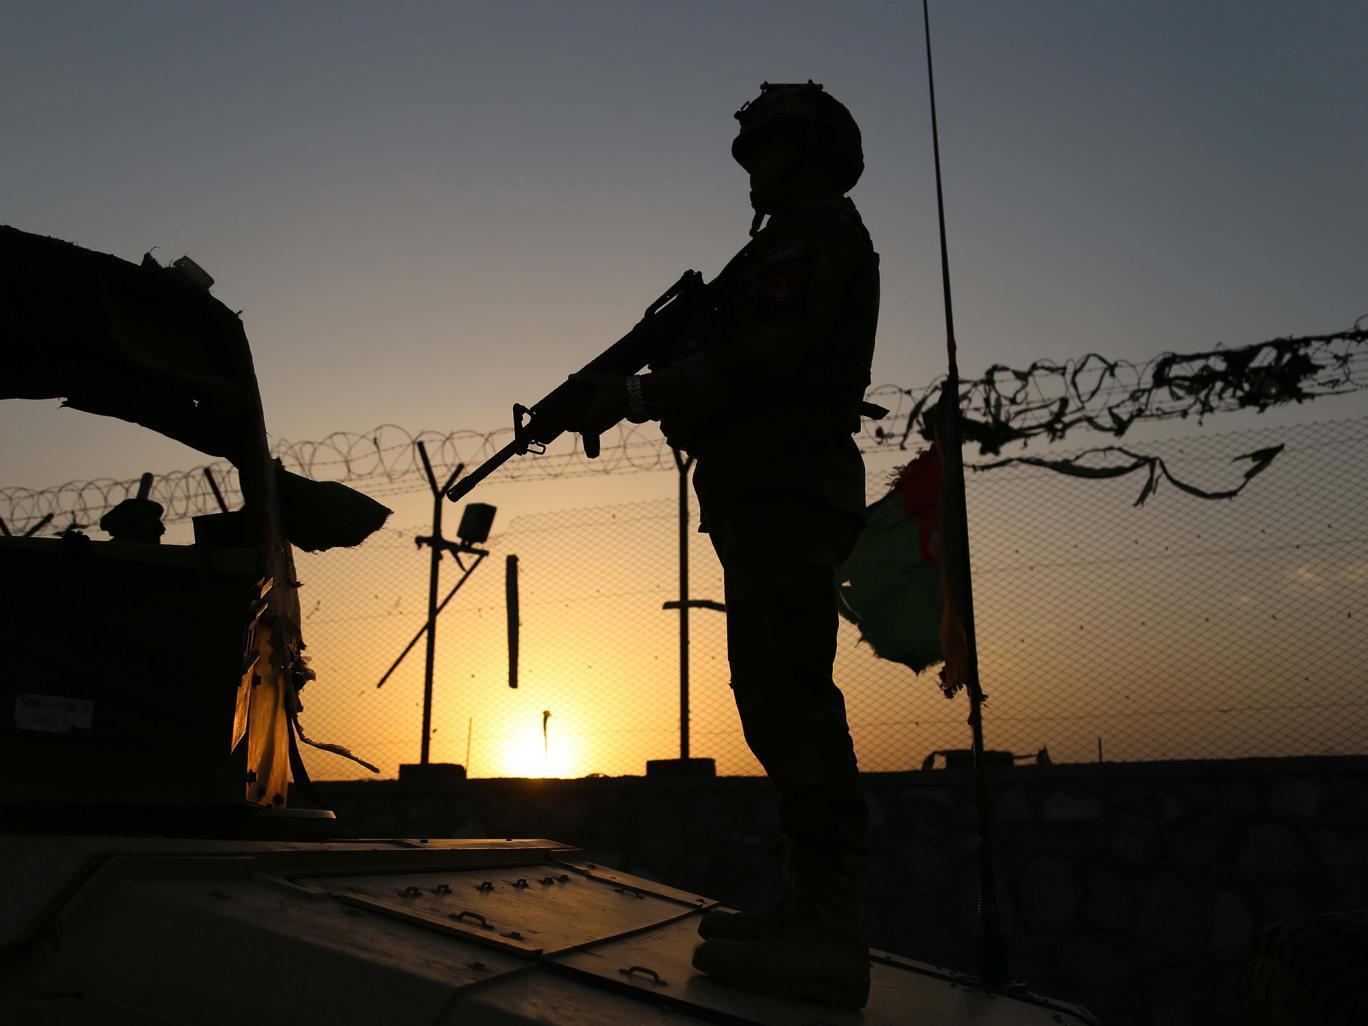 Mỹ tiêu diệt trùm IS ở Afghanistan